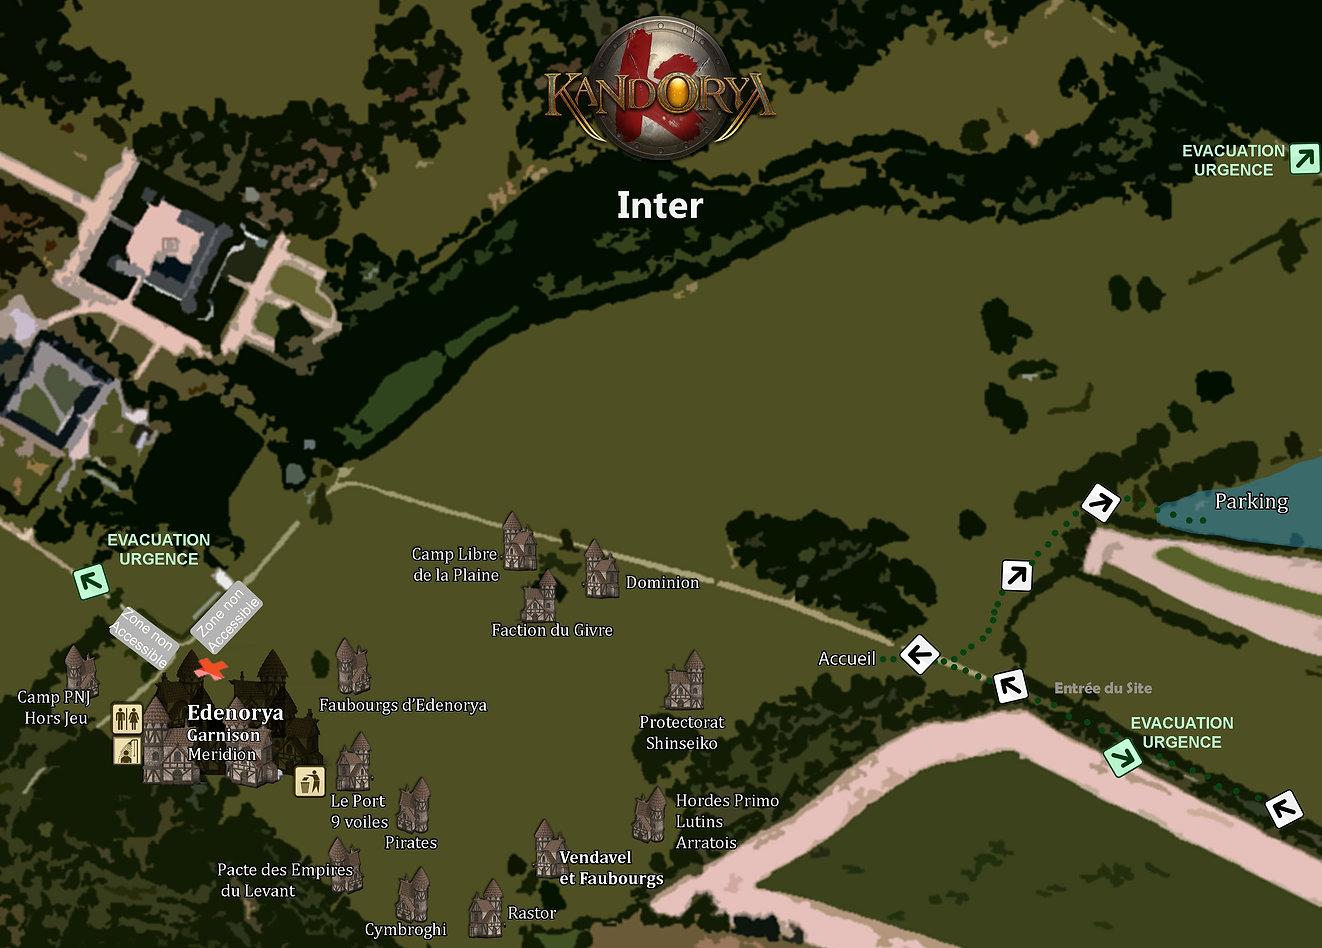 Emplacement des Camps KANDORYA Inter.jpg